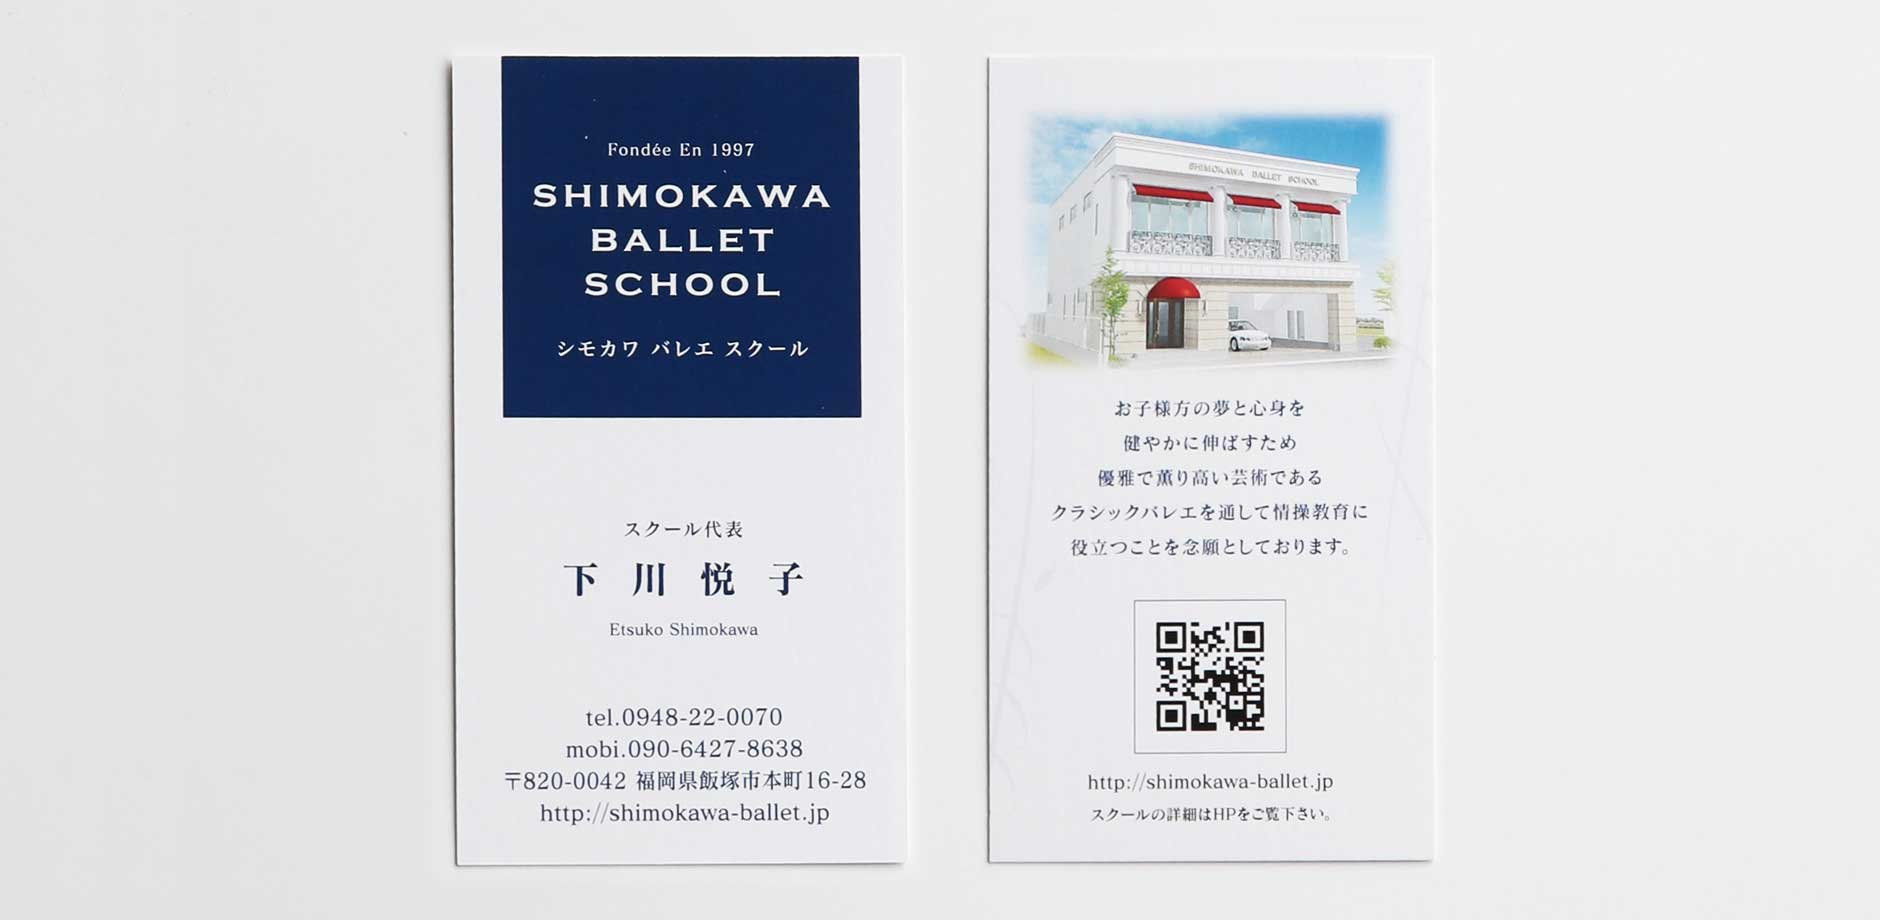 SHIMOKAWA BALLET SCHOOL画像